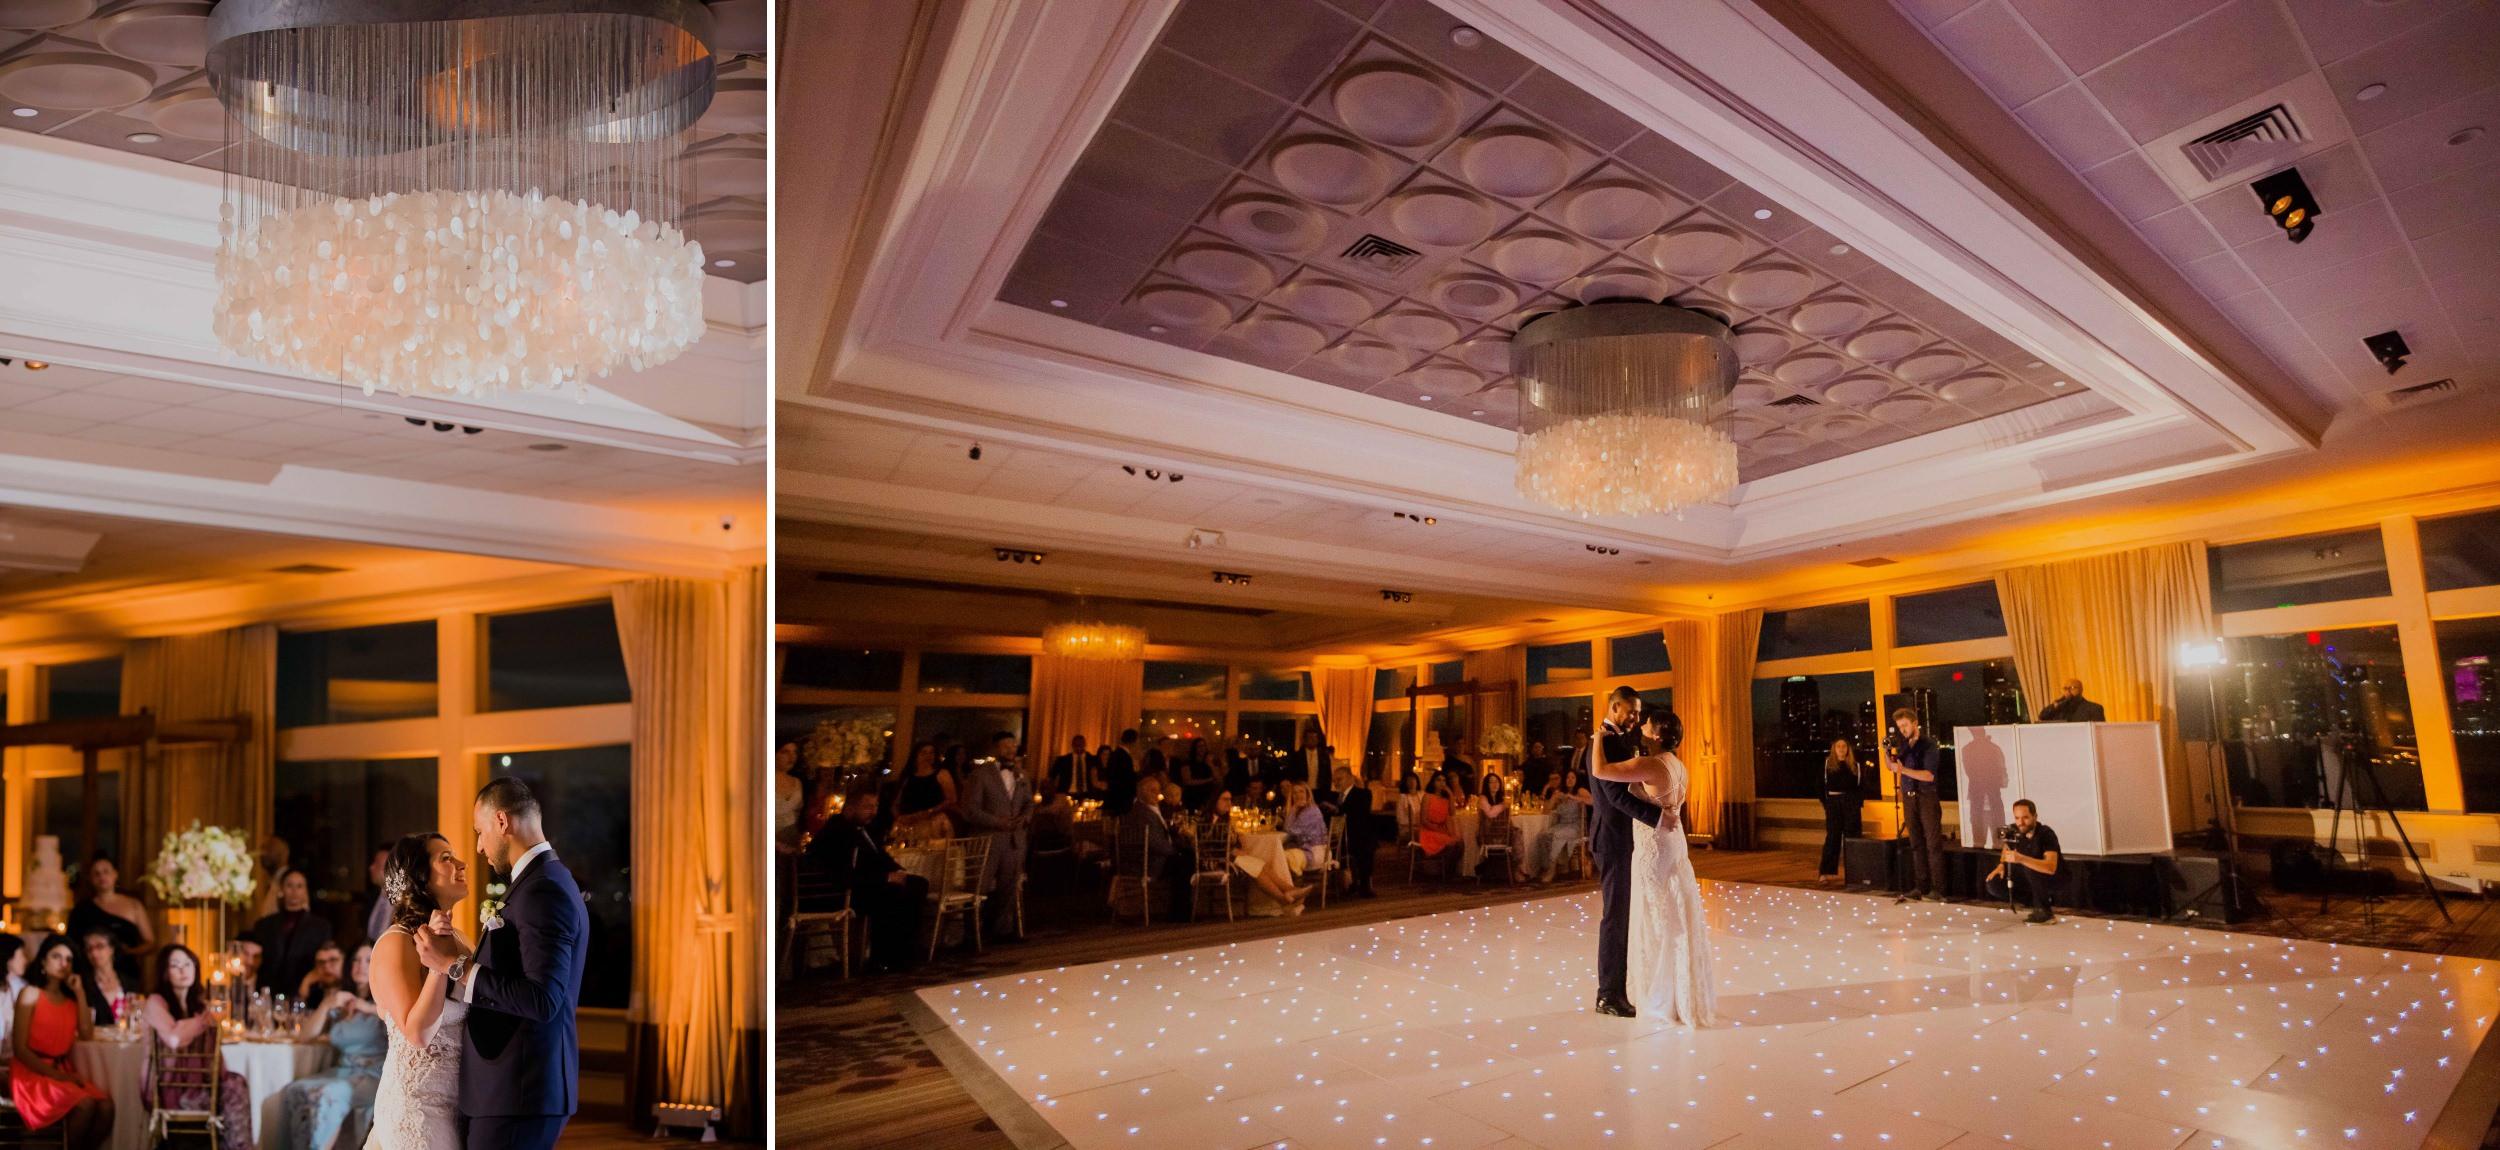 Wedding - Rusty Pelican - Key Biscayne - Santy Martinez Photography 38.jpg